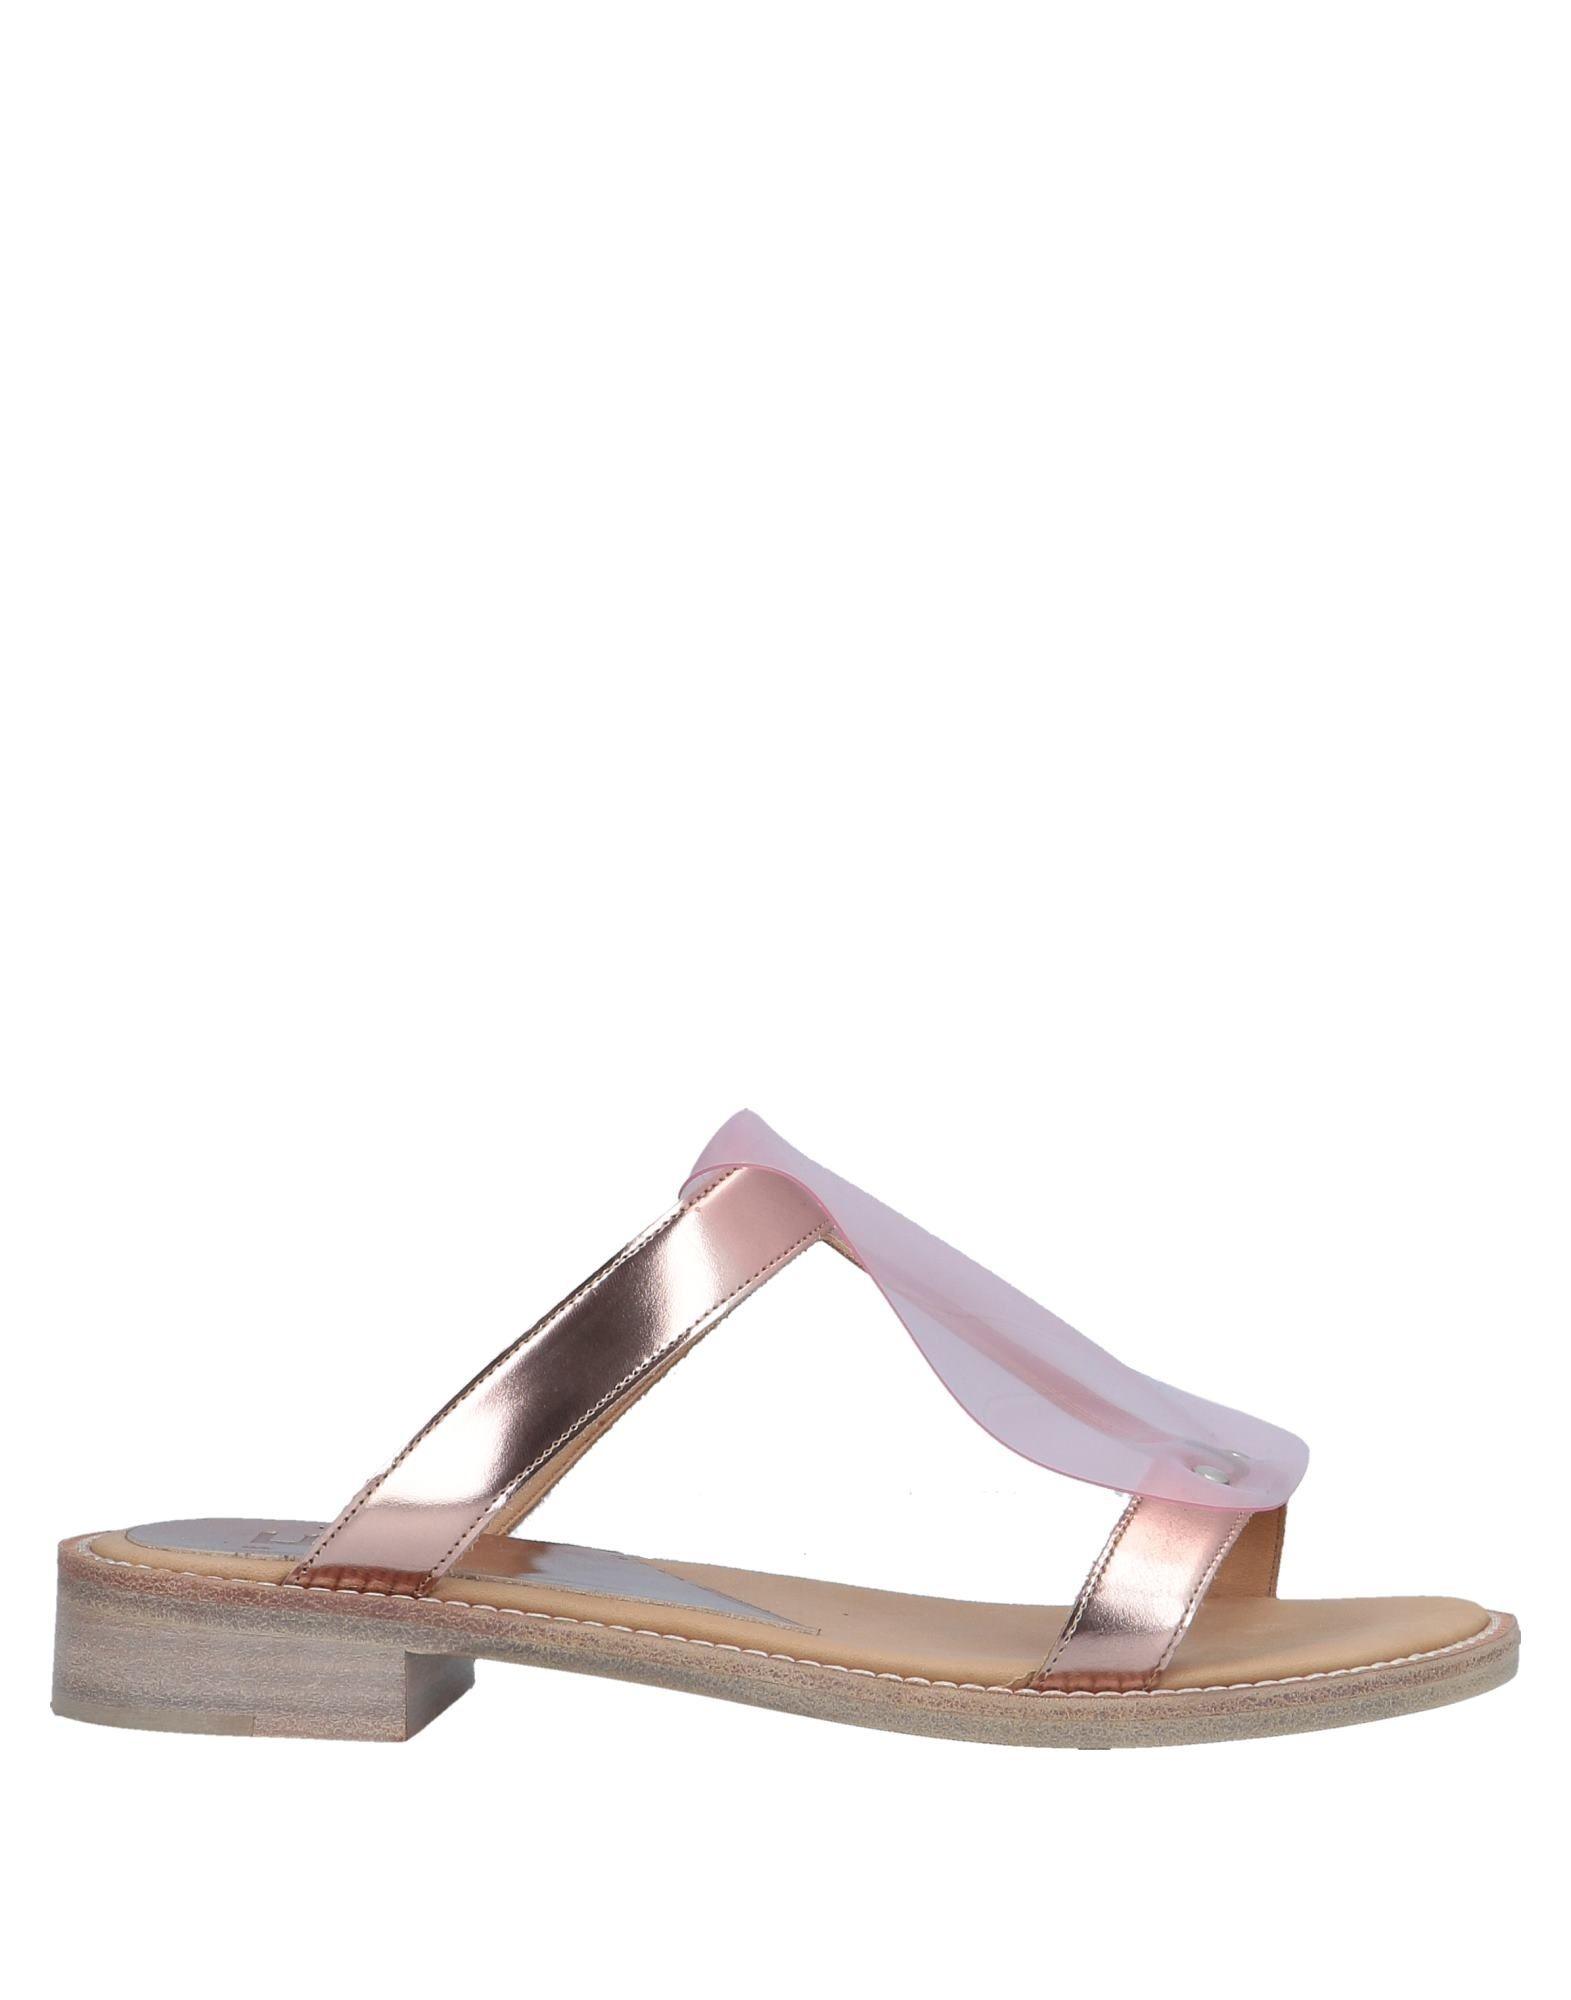 Фото - L'F SHOES Сандалии women high heel shoes platform pumps woman thin high heels party wedding shoes ladies kitten heels plus size 34 40 41 42 43